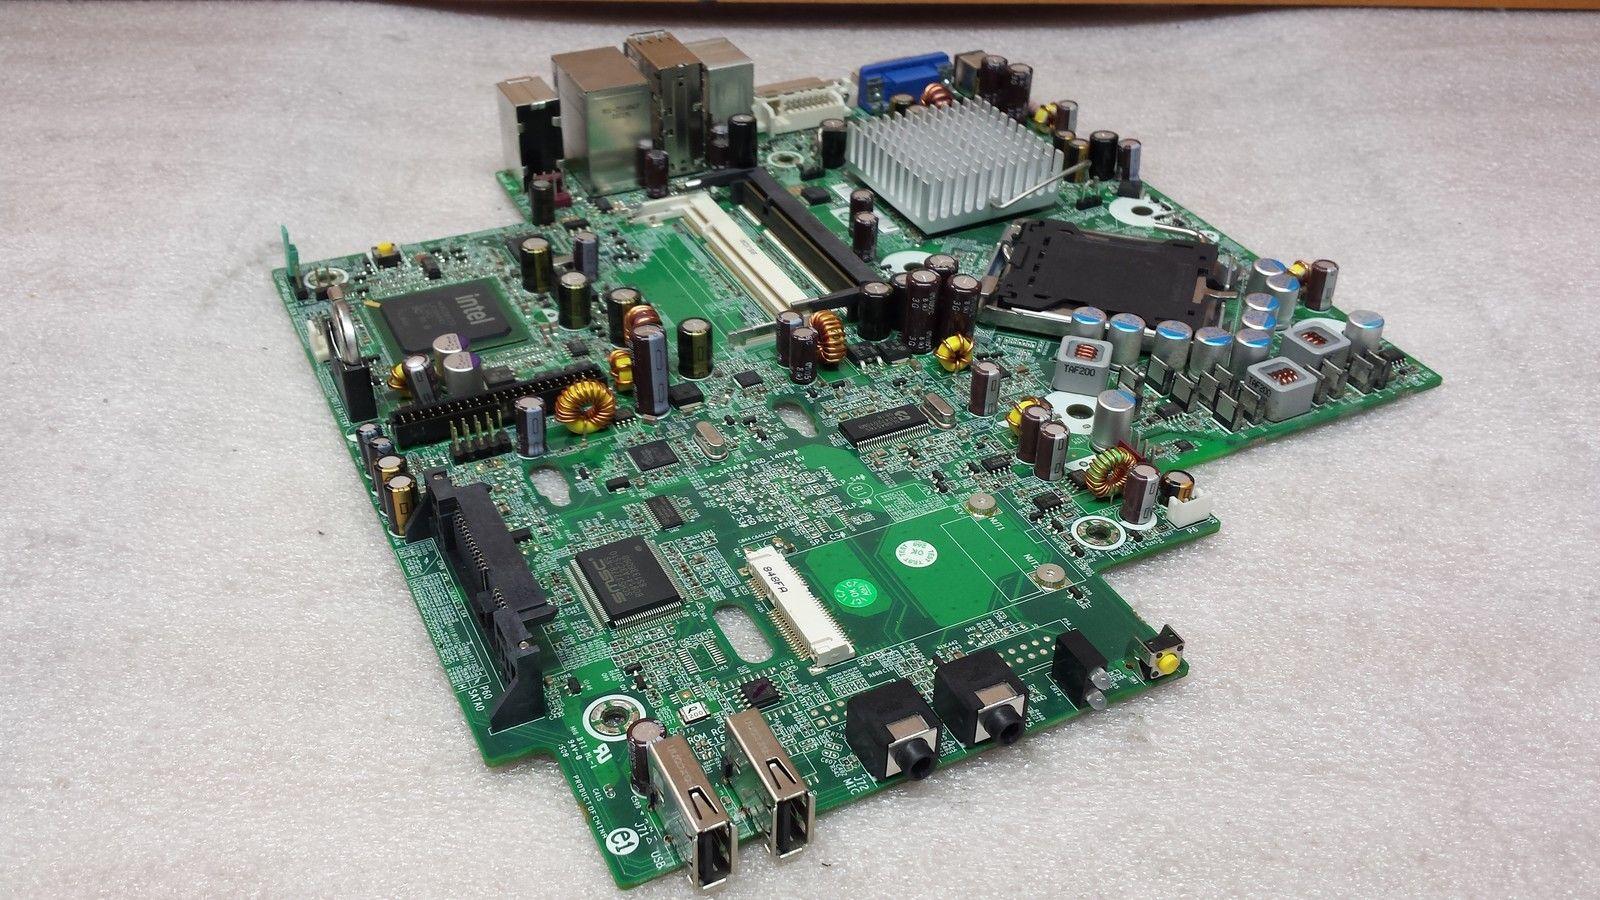 HP 437340-001 Motherboard Intel LGA 775 DDR2 SODIMM for DC7800 Ultra Slim